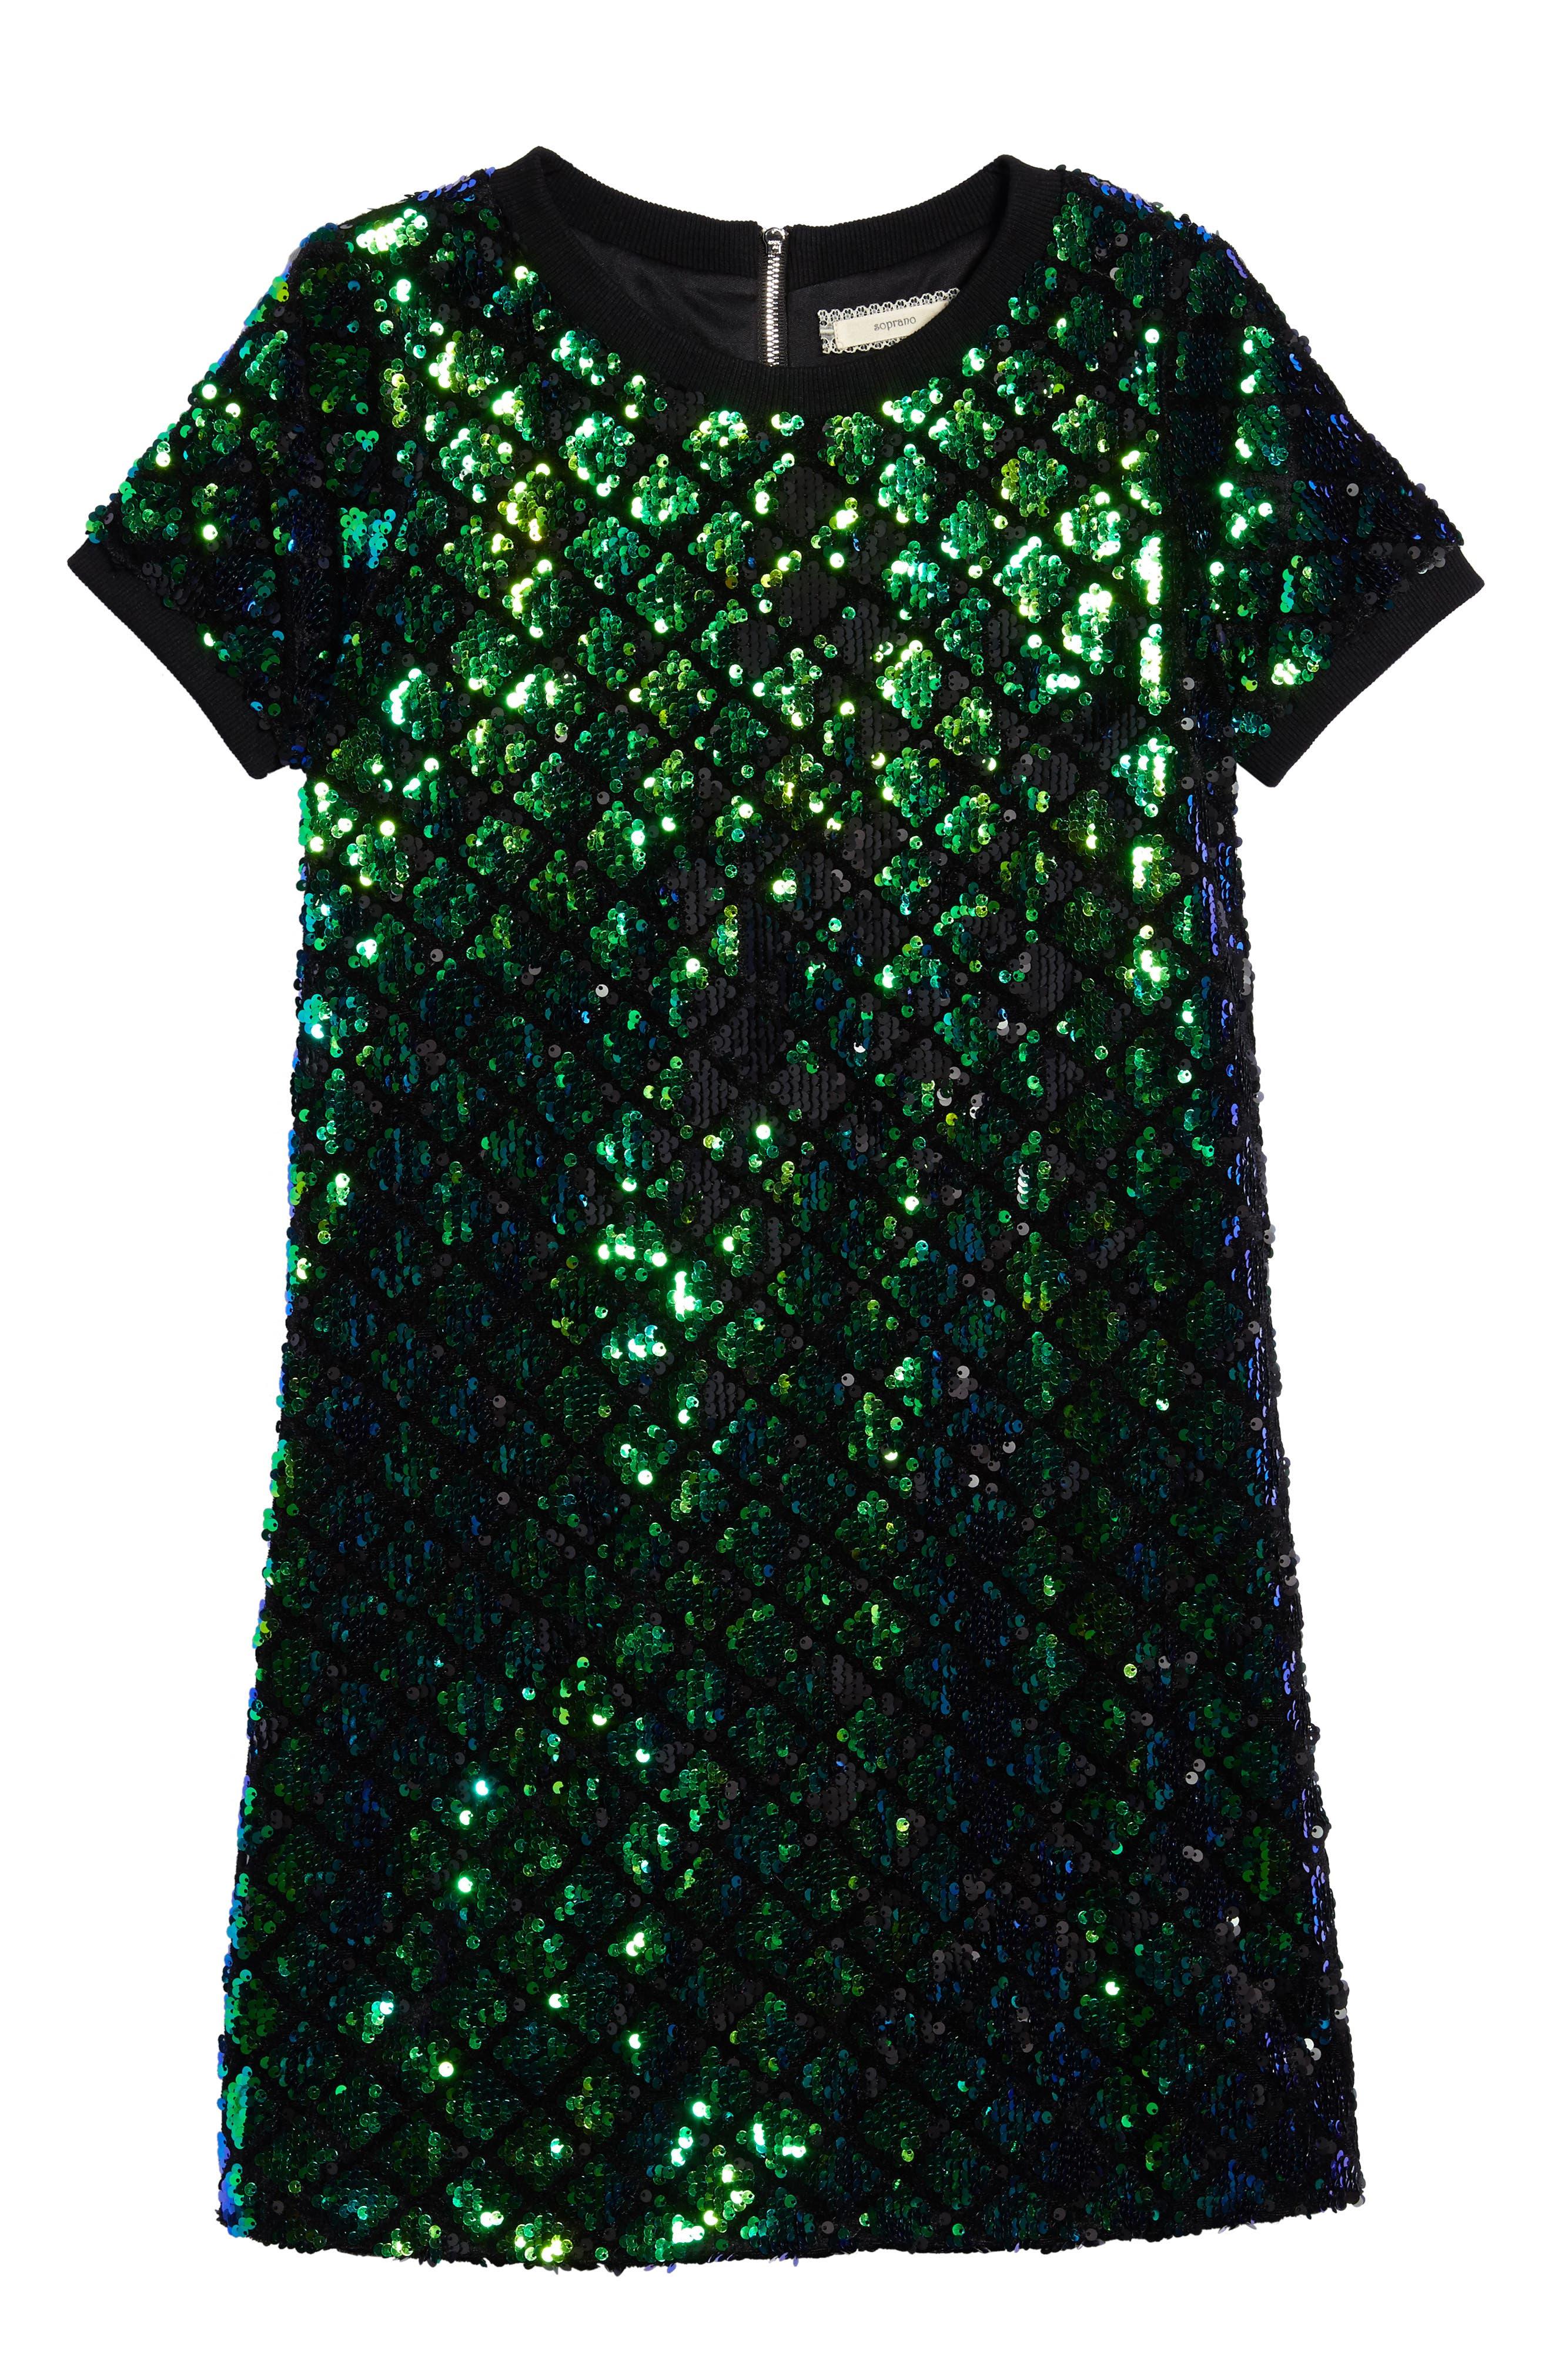 Mermaid Sequin Shift Dress,                             Main thumbnail 1, color,                             440